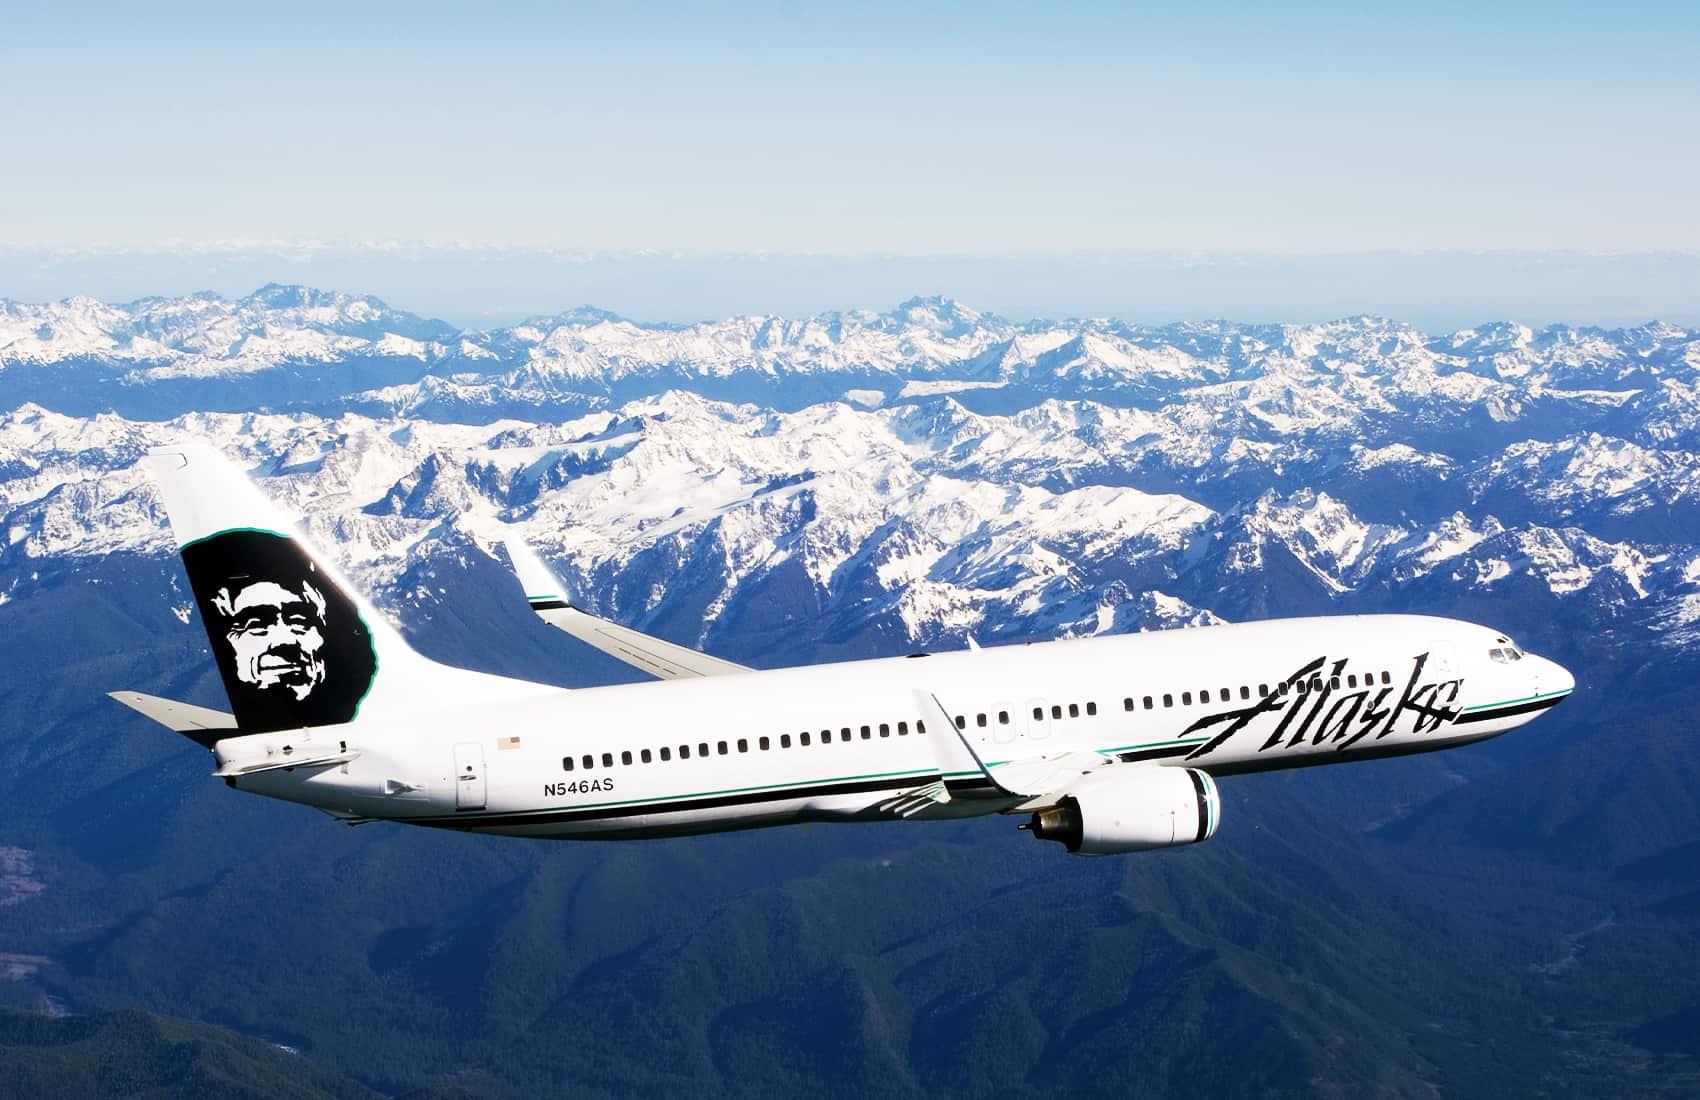 Alaska Air Boeing 737 Airliner